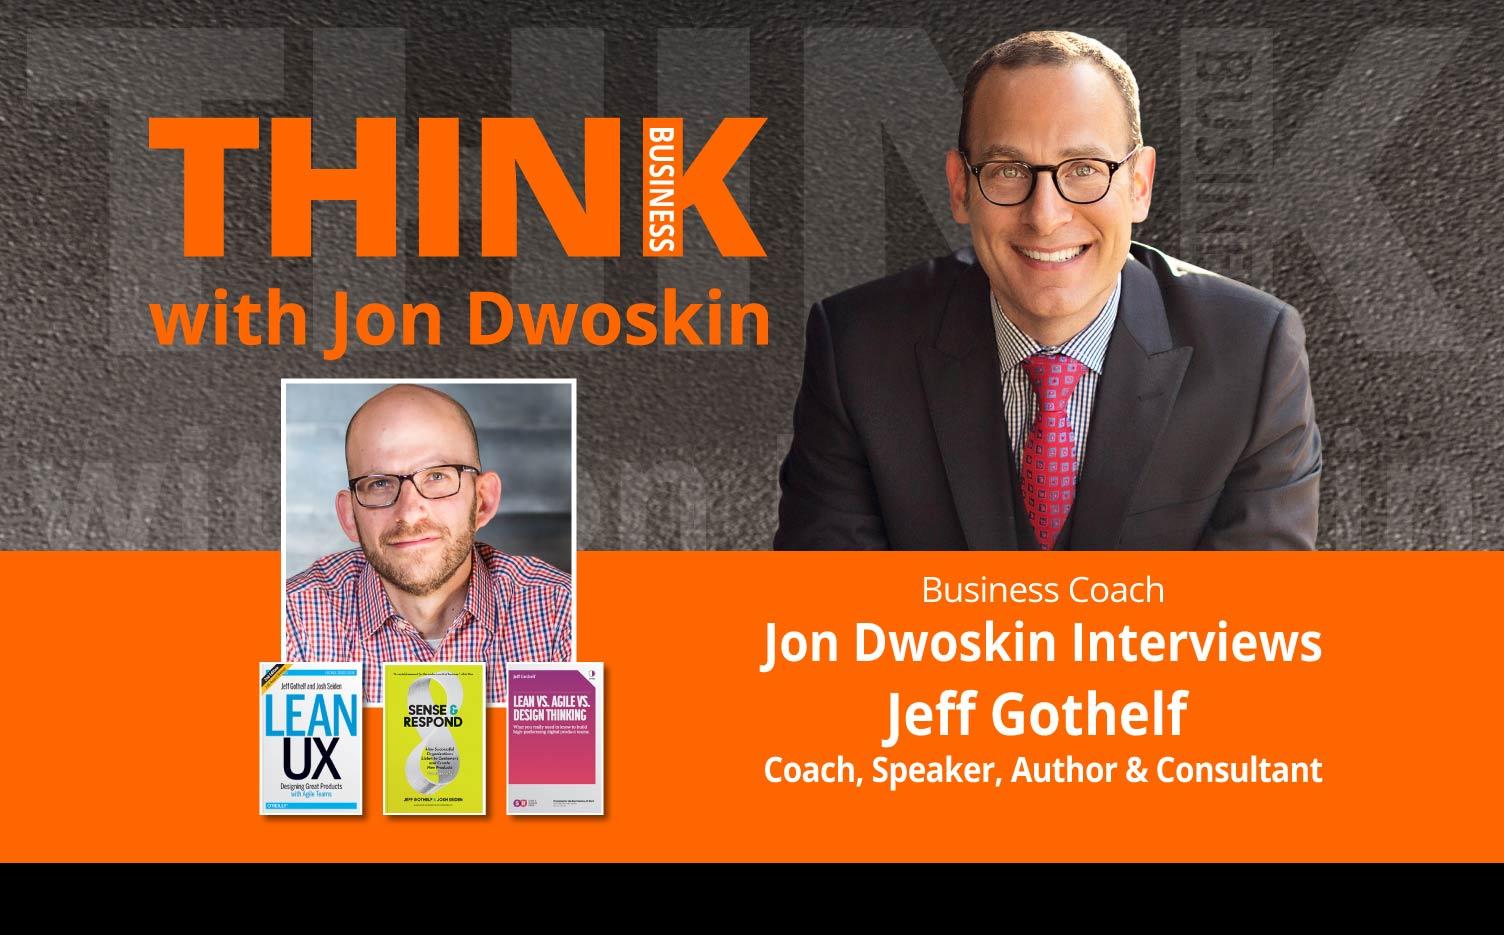 THINK Business Podcast: Jon Dwoskin Interviews Jeff Gothelf, Coach, Speaker, Author & Consultant